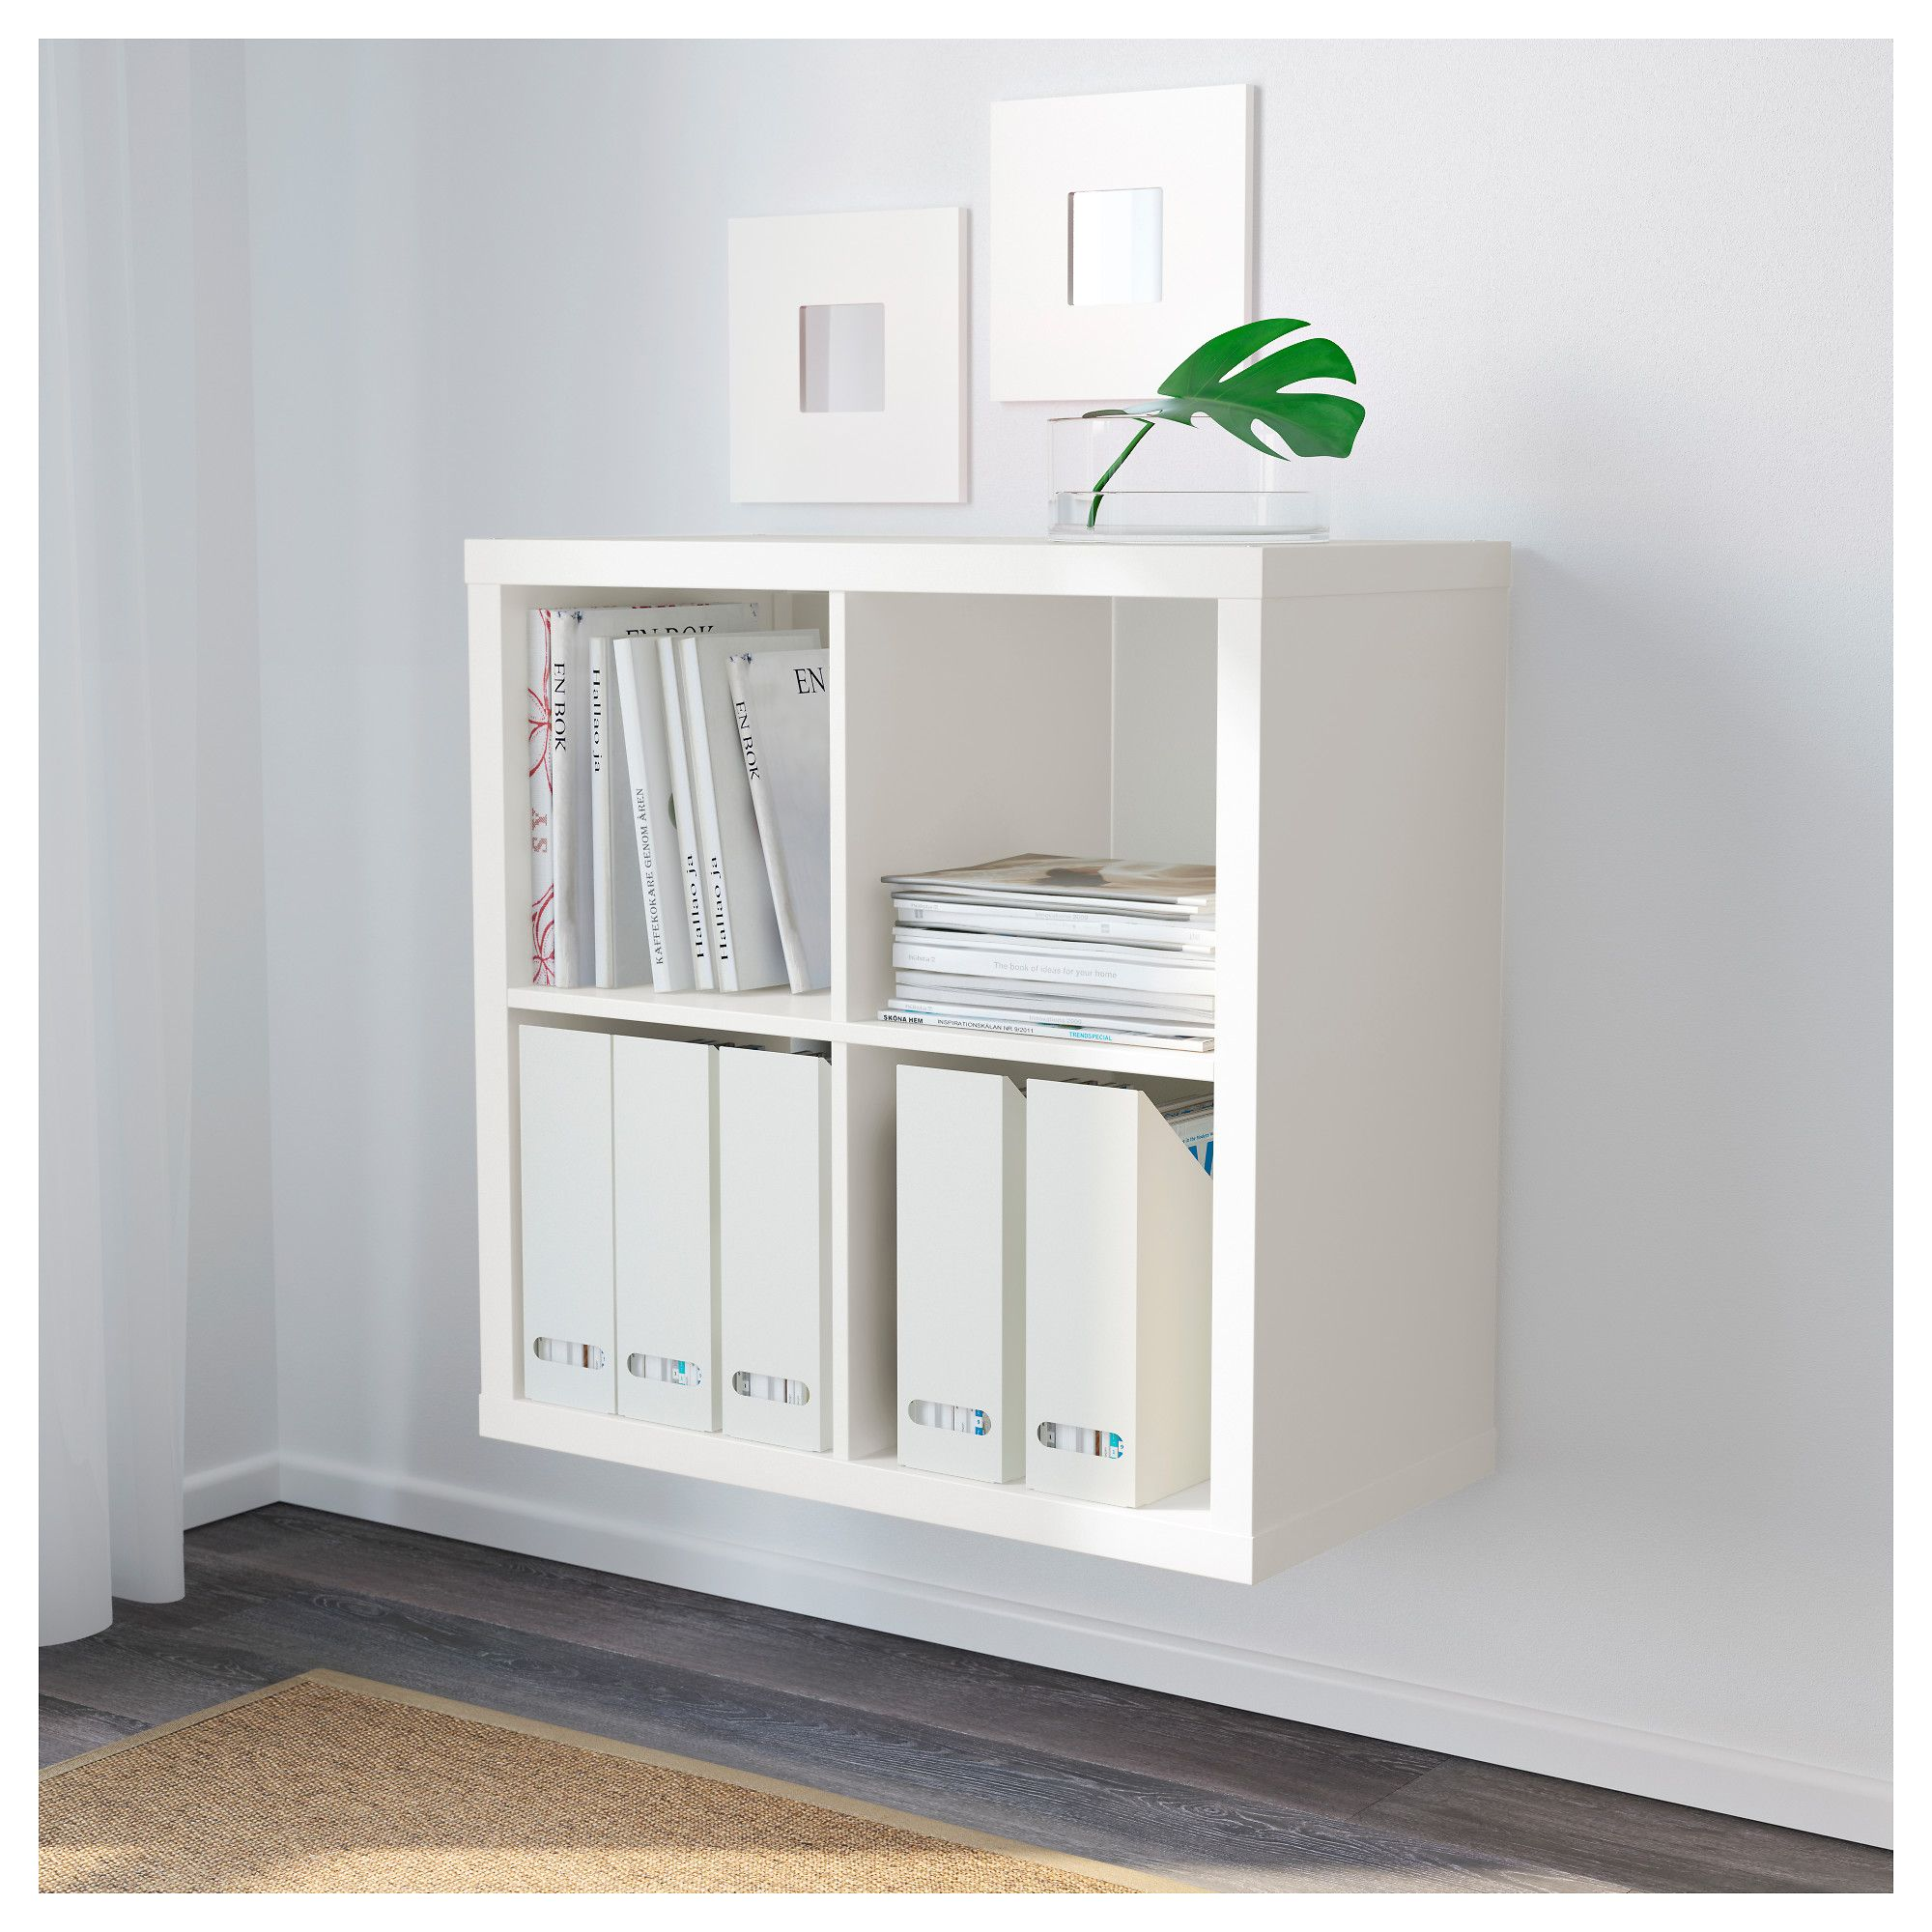 Wandmeubel Kallax Ikea.Ikea Kallax Shelf Unit White Bytovy Dizajn A Dekoracie